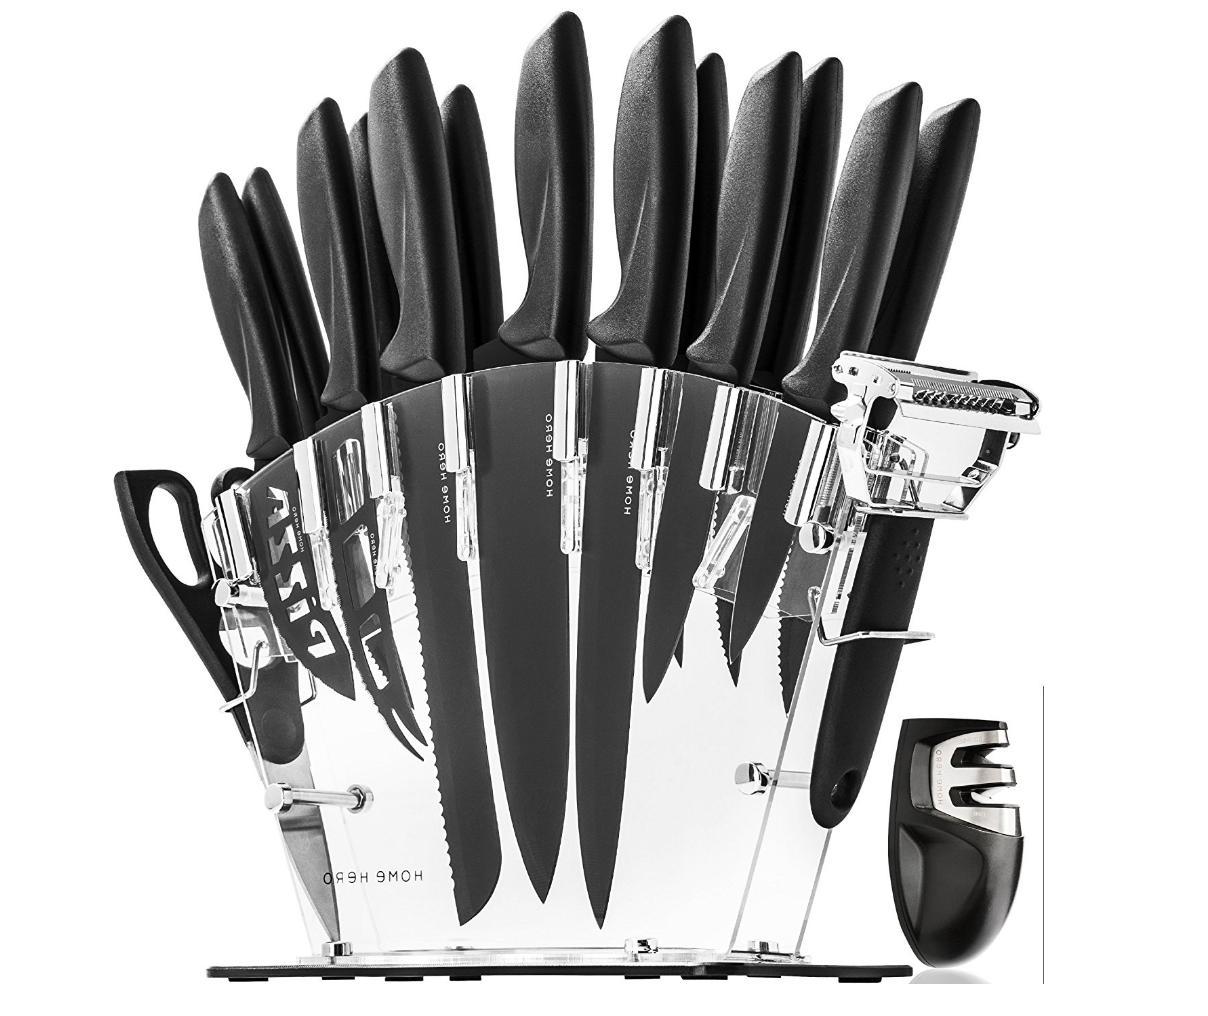 Culinary Knife Set Steak Knives Dishwasher Safe Accessories